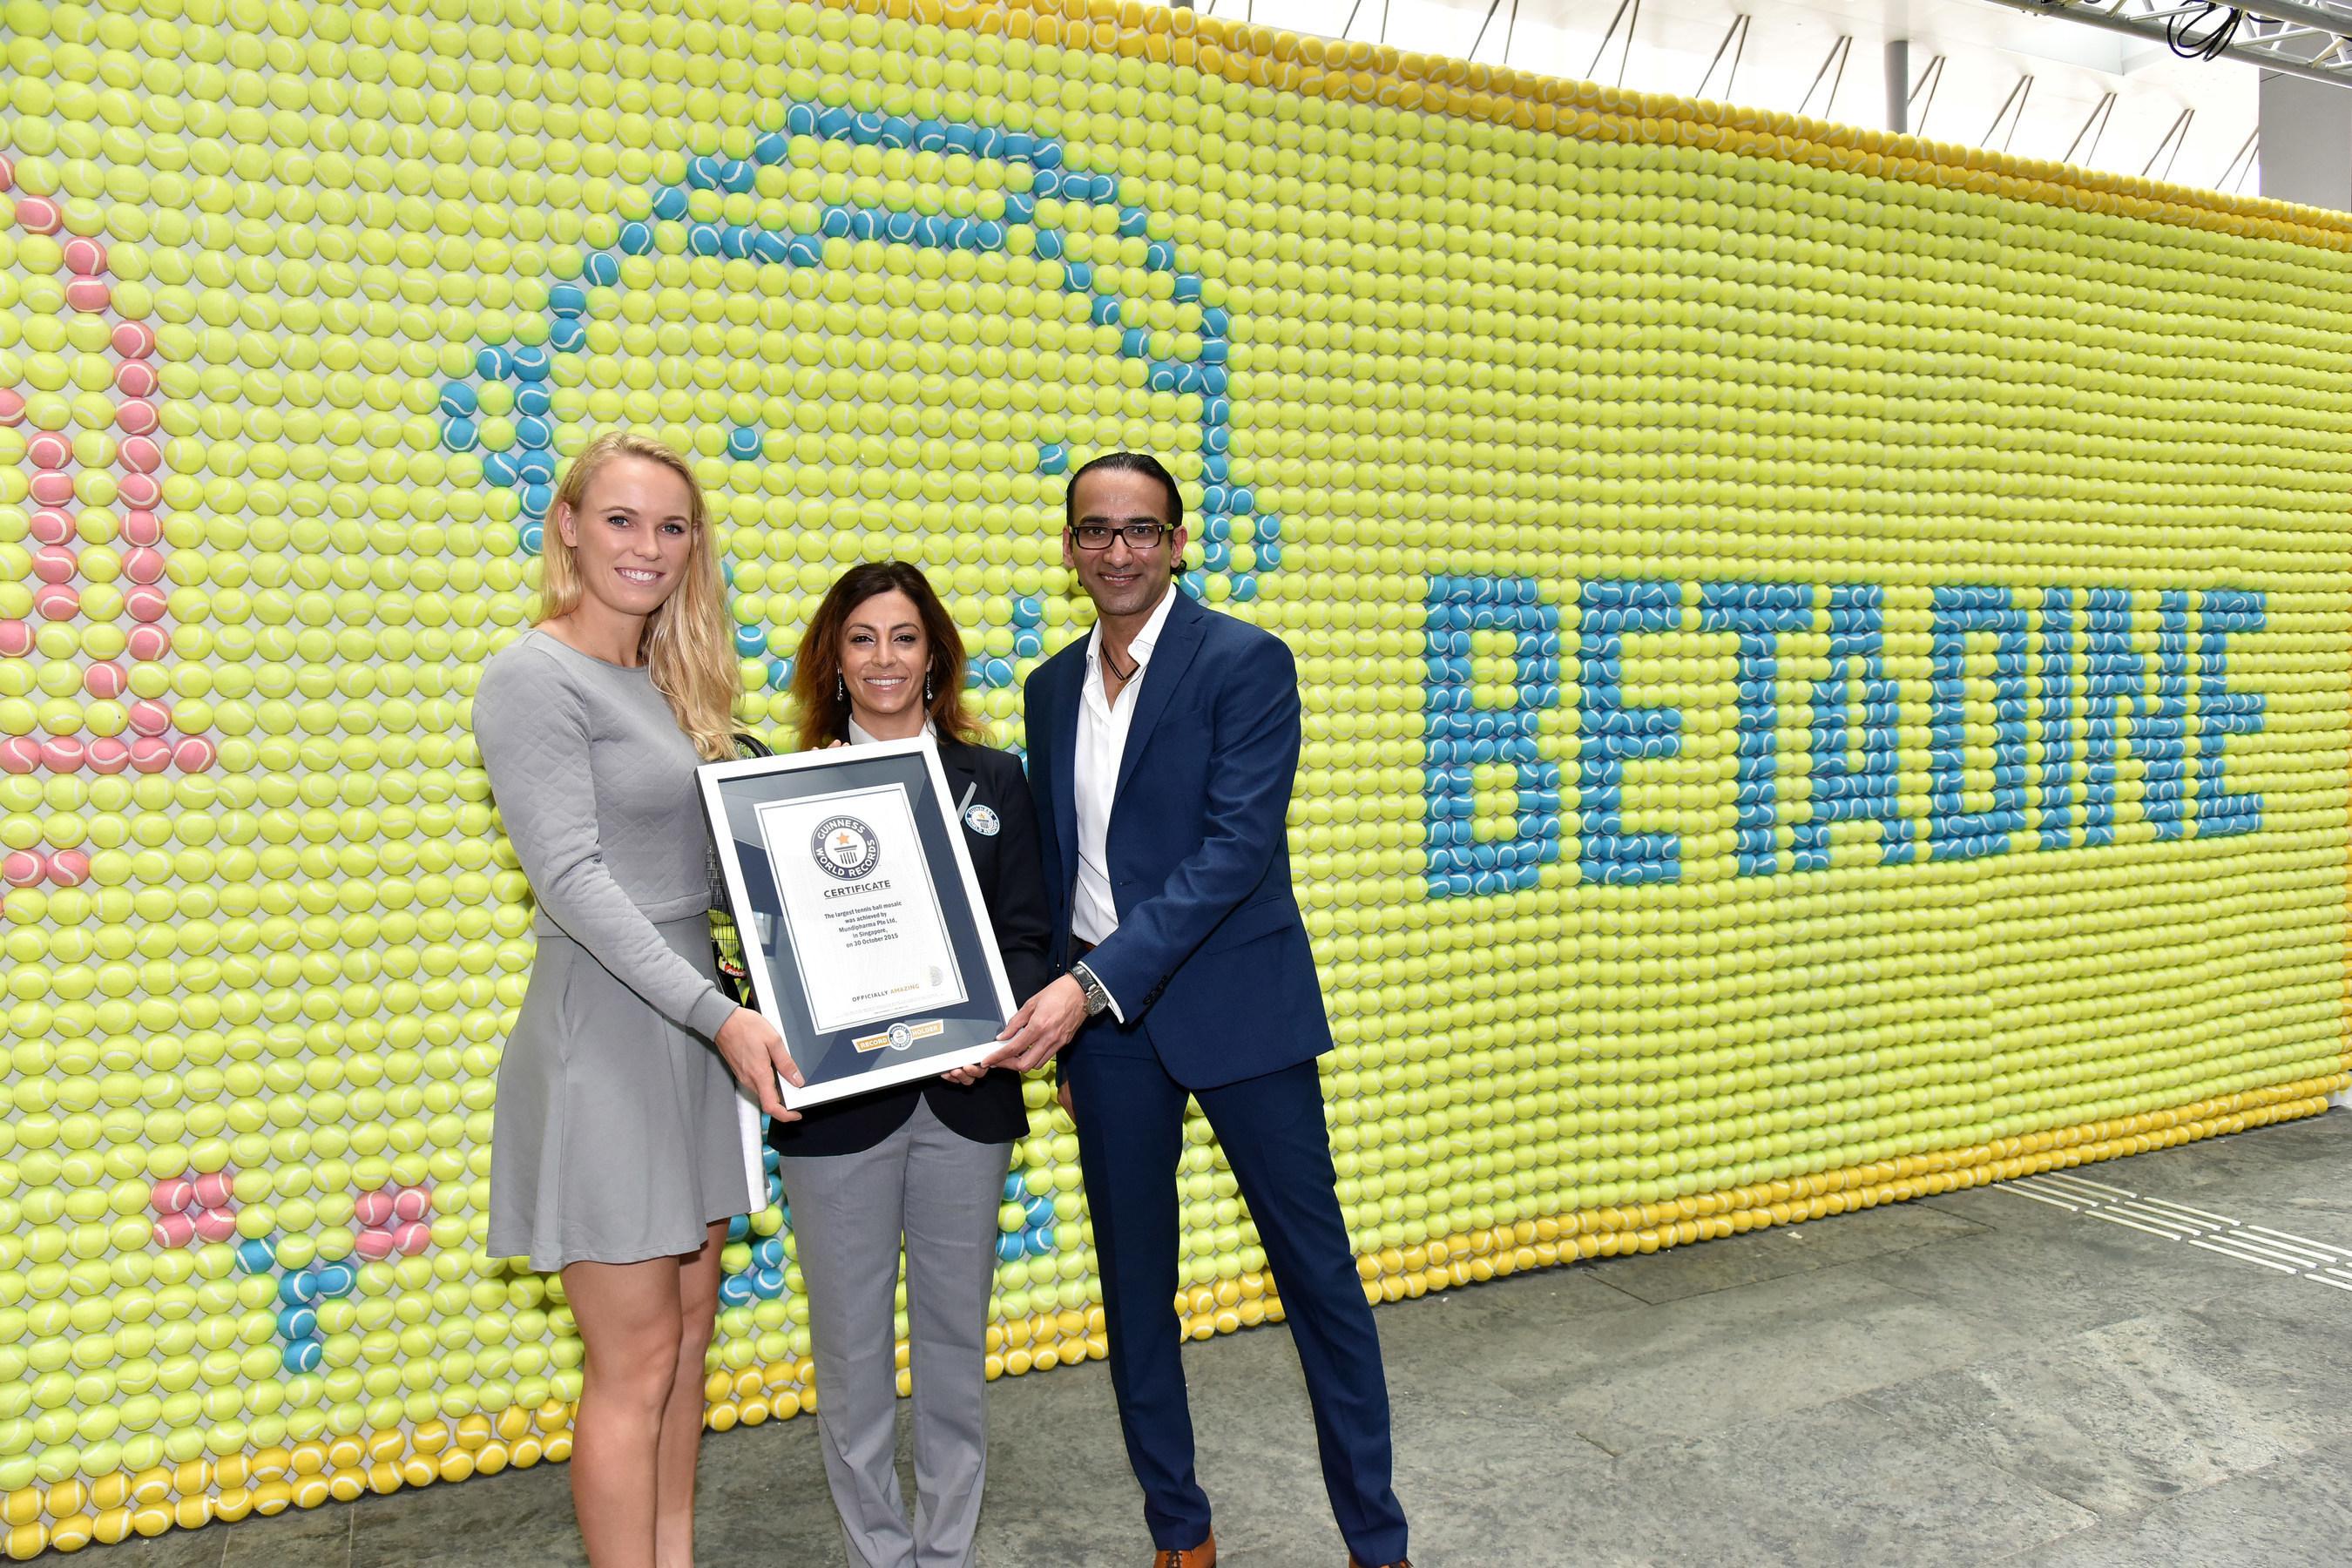 Left to right: International Tennis Star Caroline Wozniacki, GUINNESS WORLD RECORDS(TM) Adjudicator Lucia ...